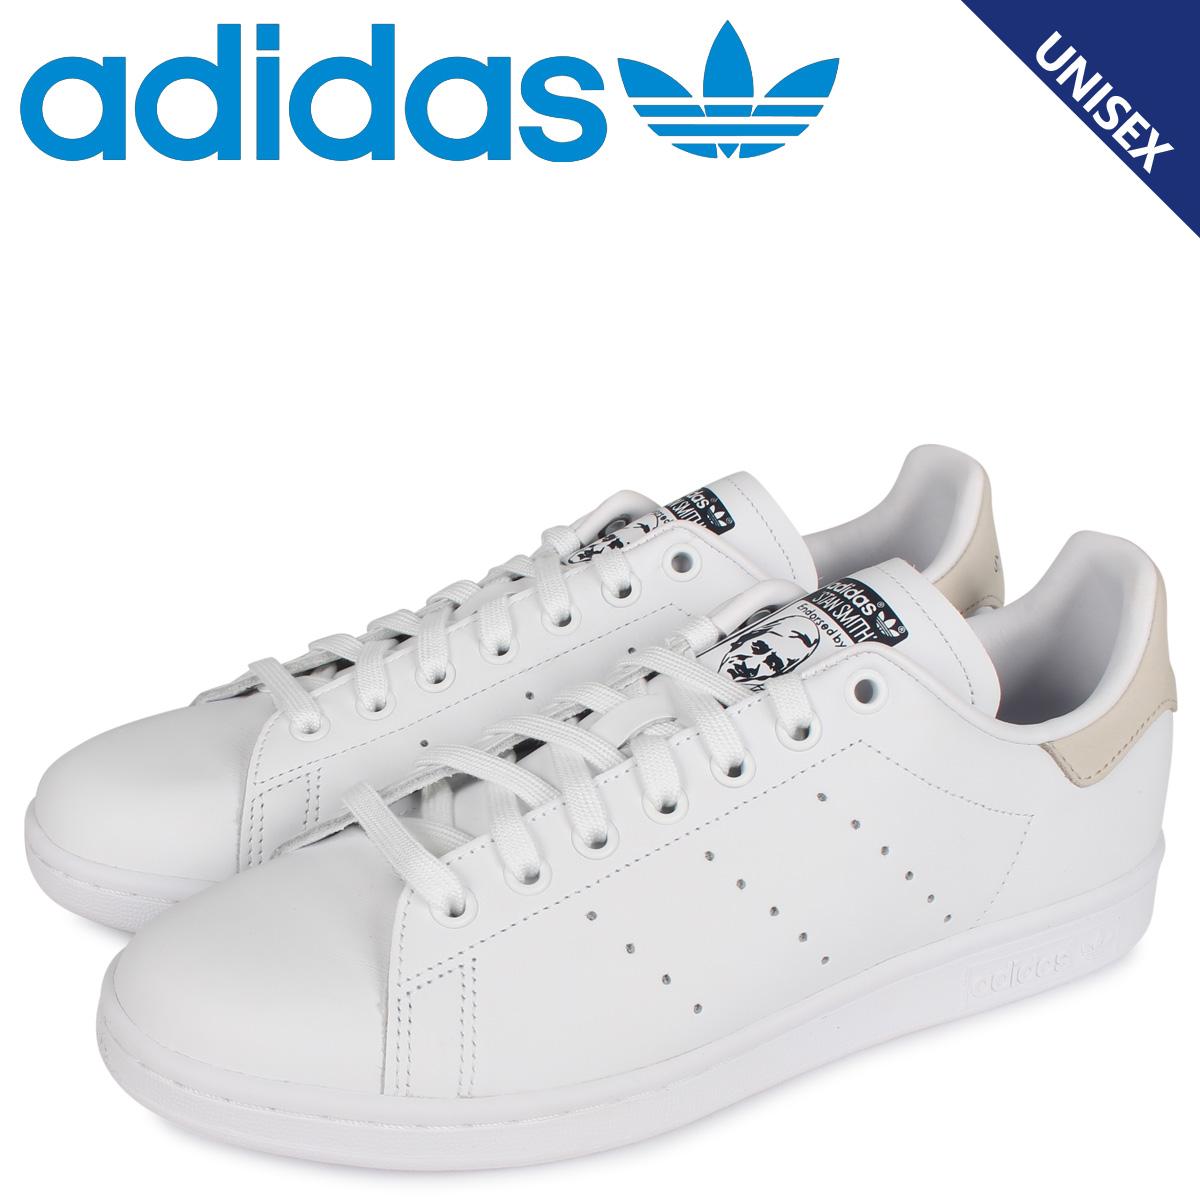 adidas Originals アディダス オリジナルス スタンスミス スニーカー メンズ レディース STAN SMITH ホワイト 白 FV5068